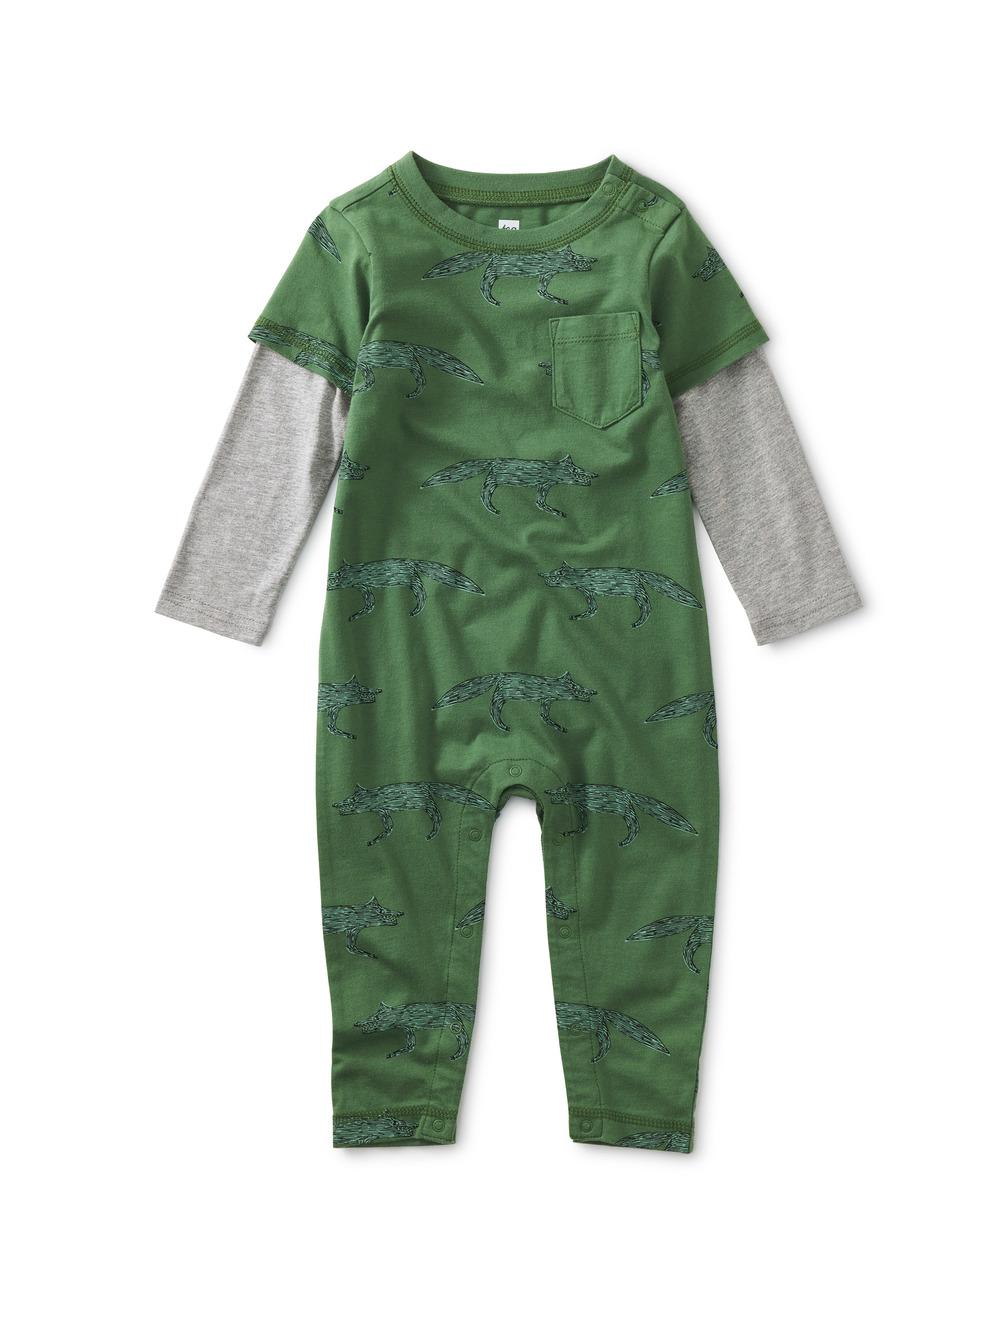 Layered Sleeve Baby Romper